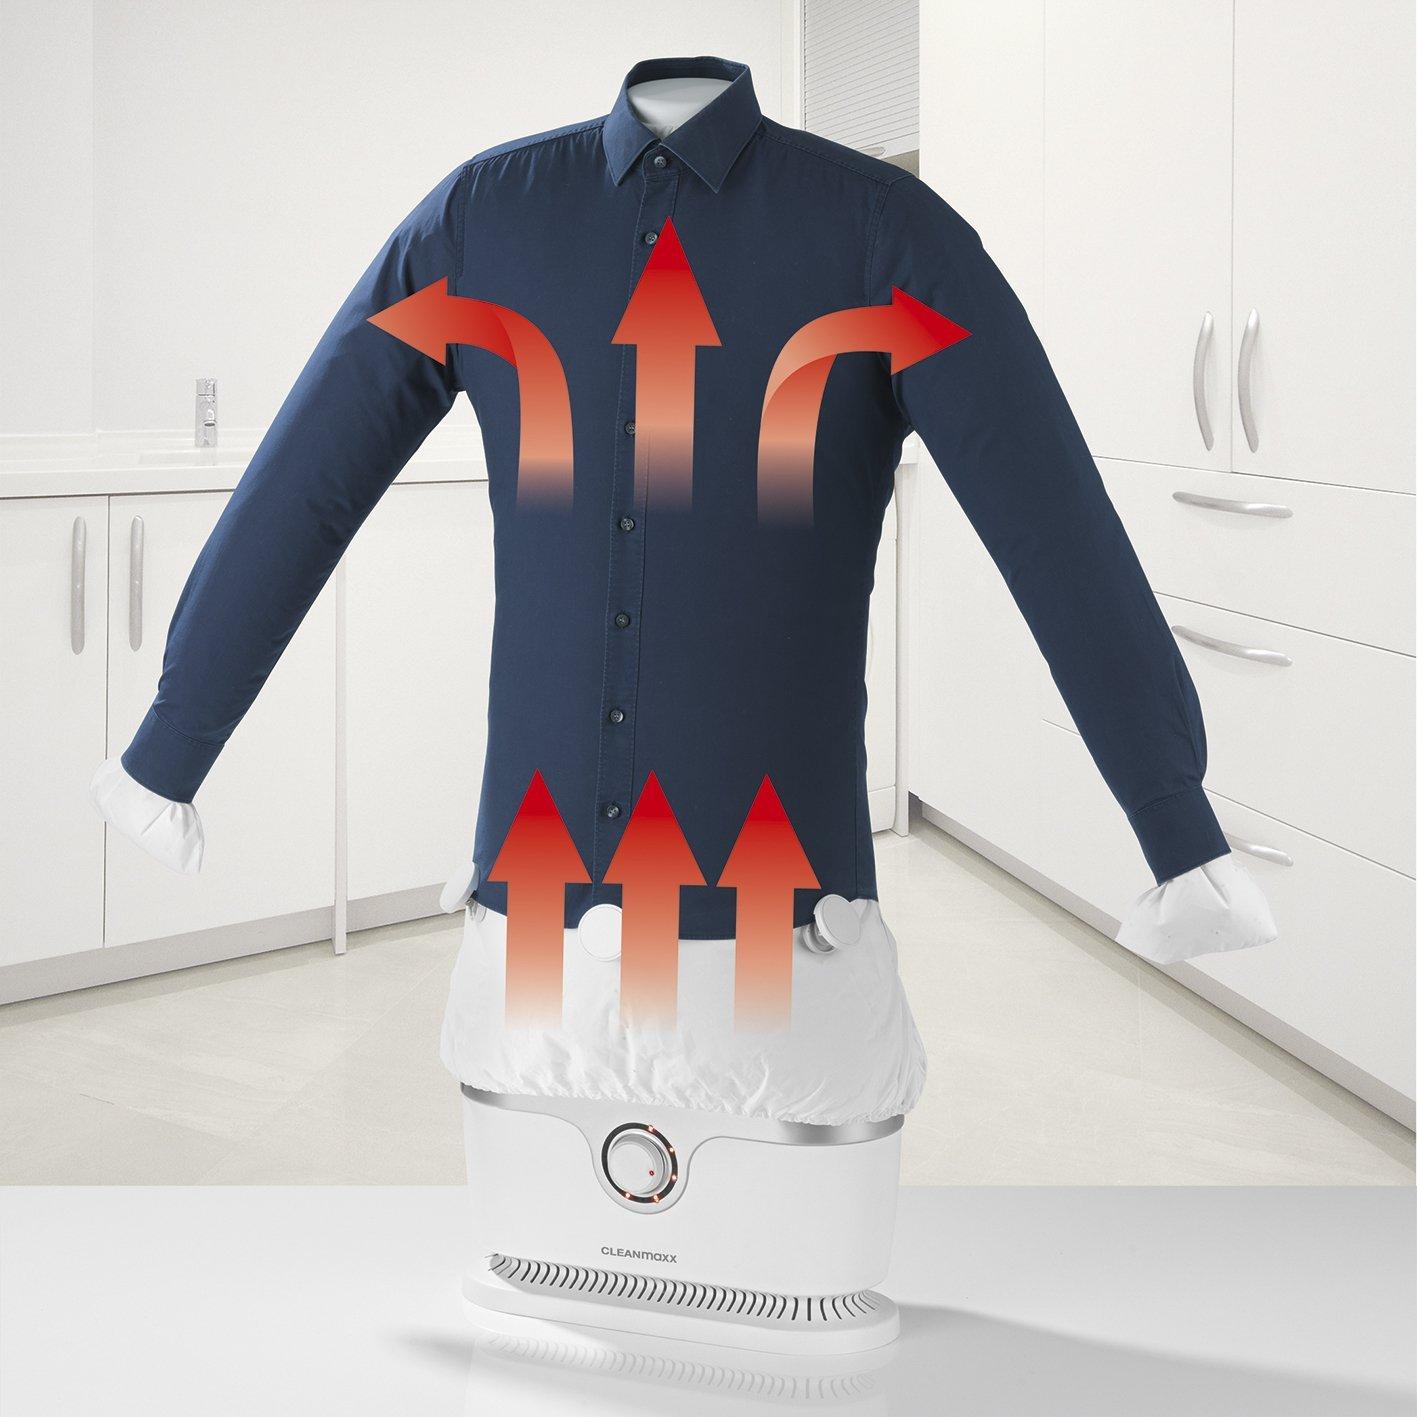 Ibood.de: Cleanmaxx Bügelautomat Hemdenbügler